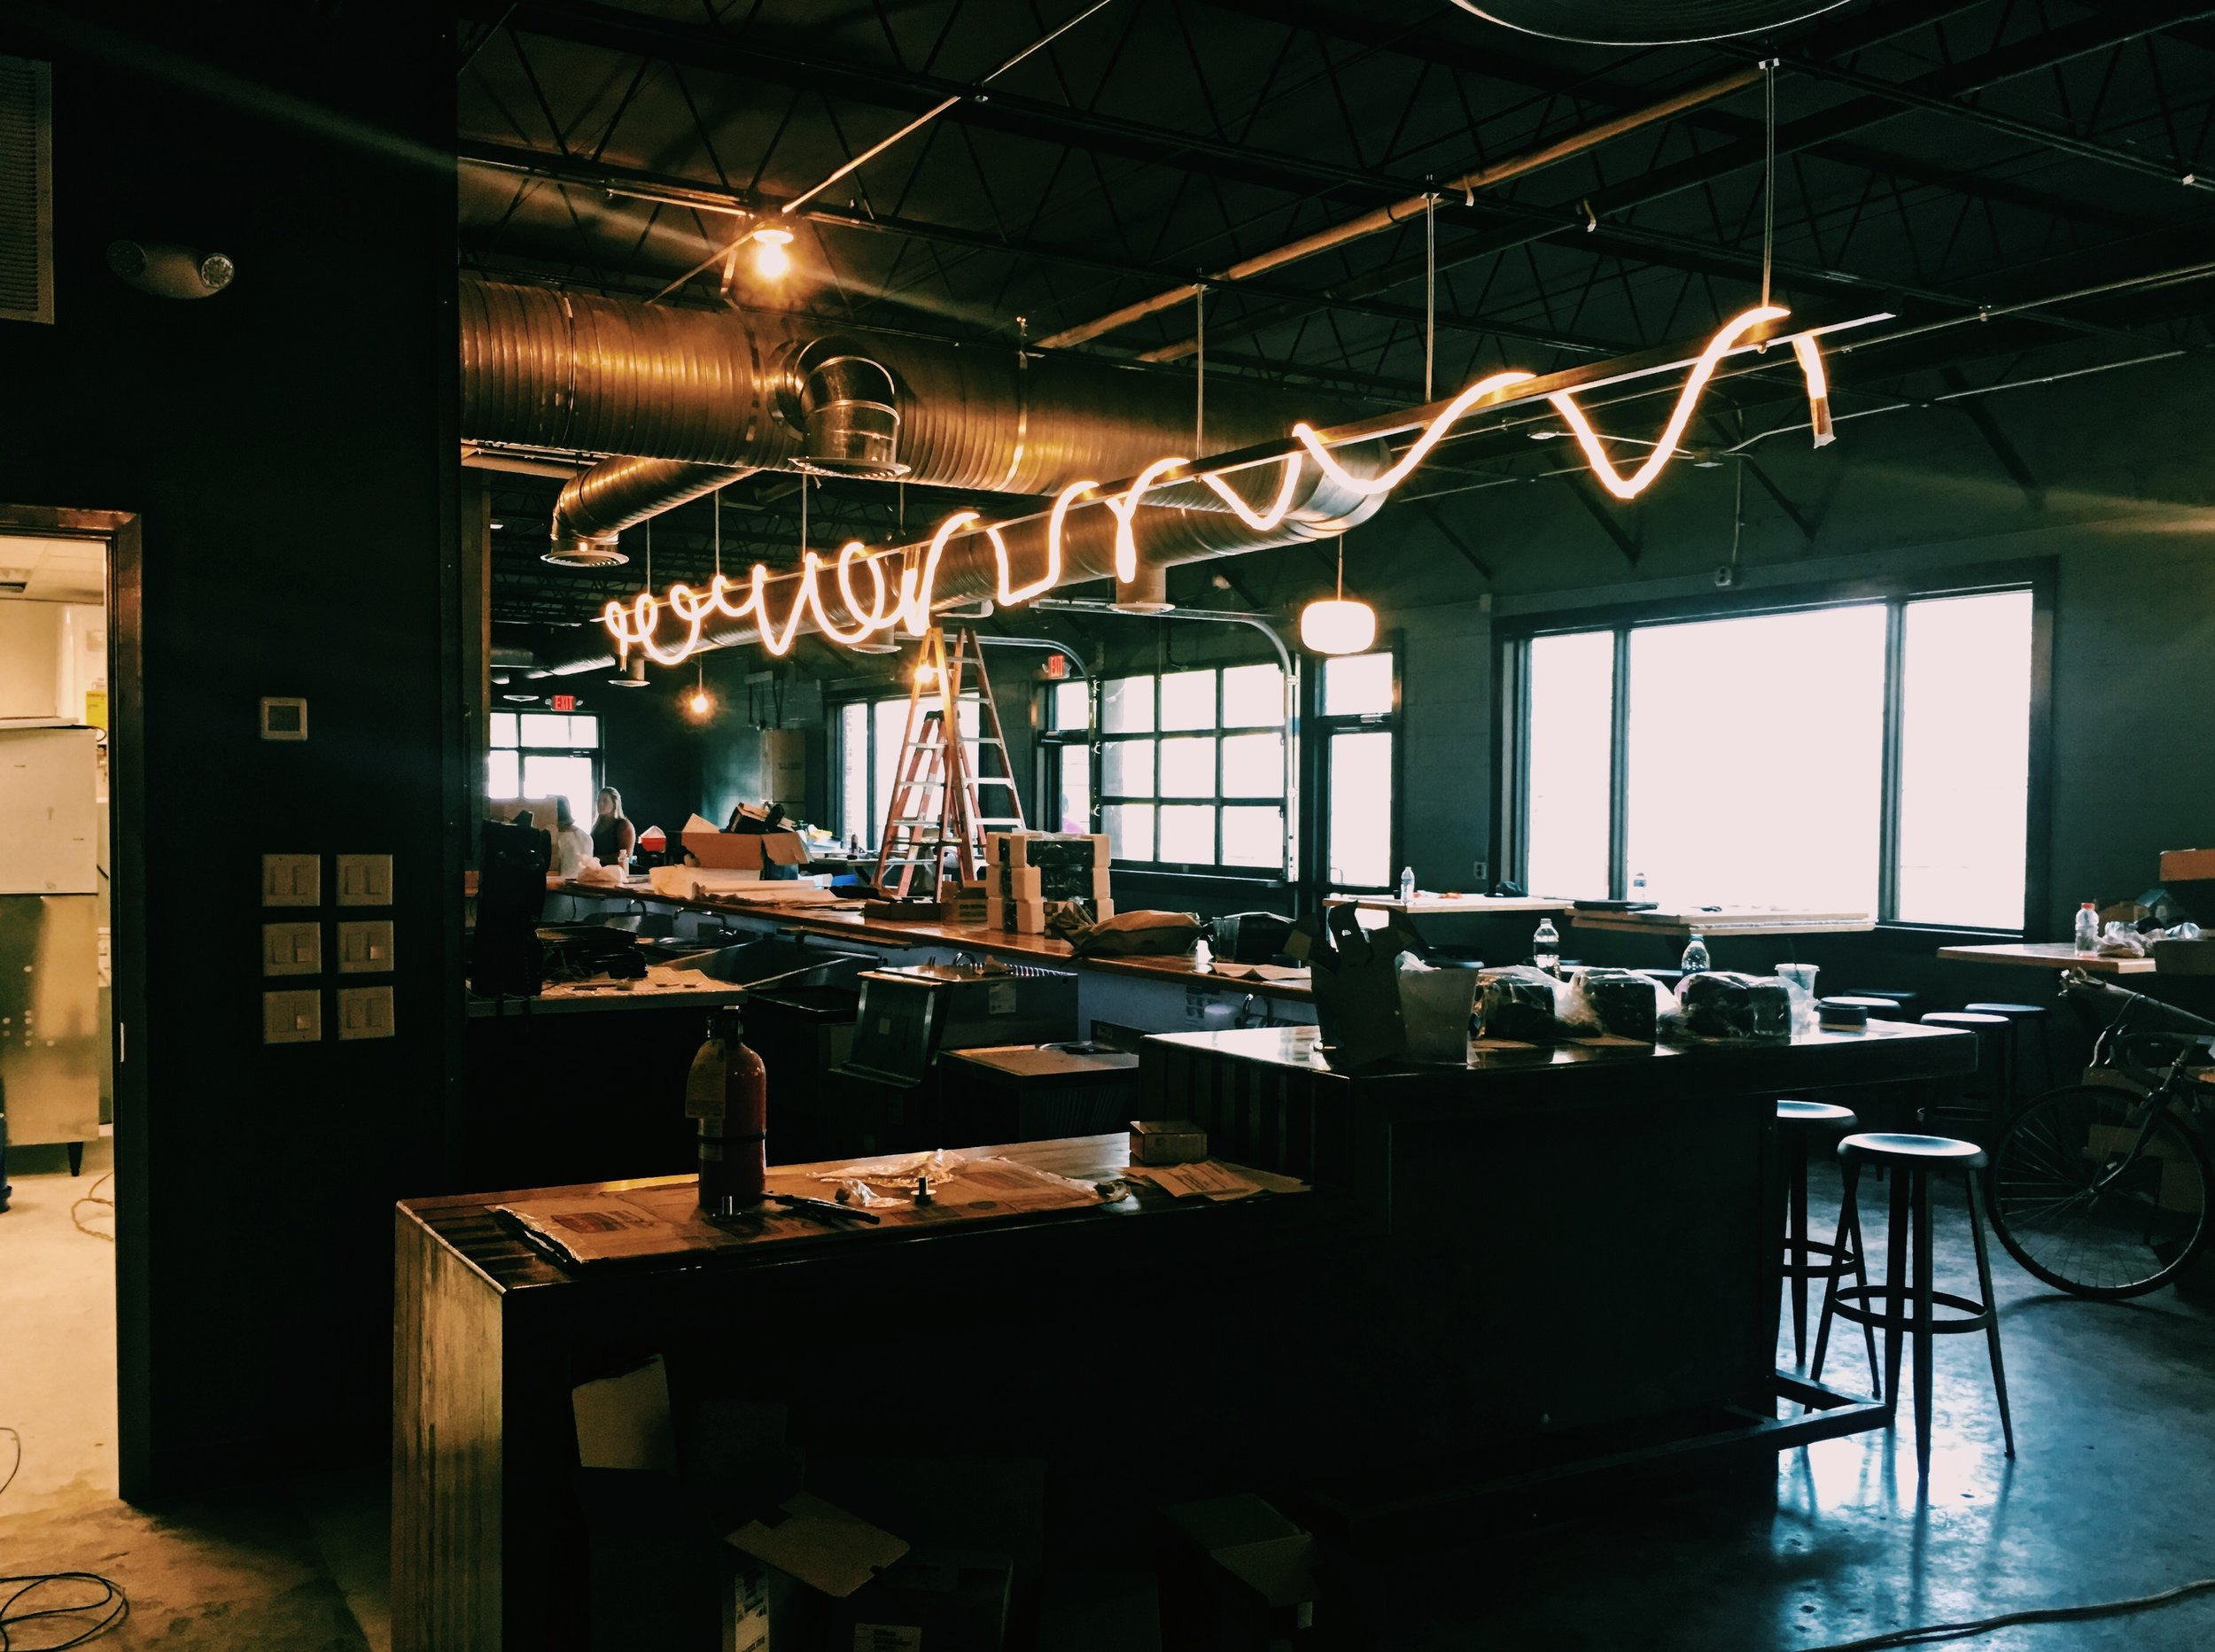 BOGG'S SUPPLY | Atlanta, GA (Designer: www.maggienmcbride.com)